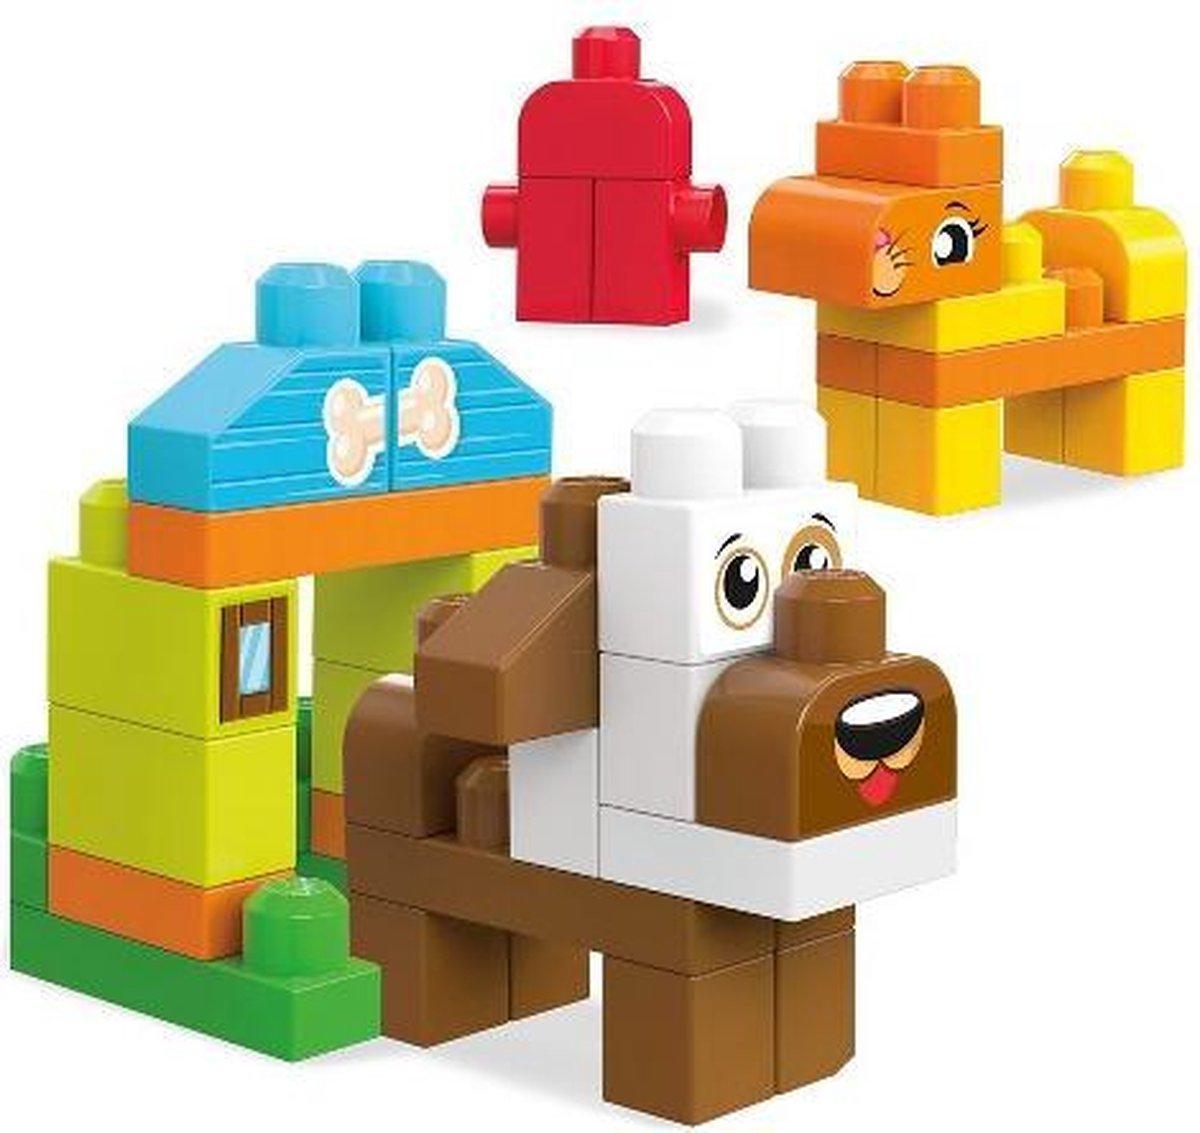 Fisher-Price Mega Bloks Dieren Bouwen, poes, hond en brandweerkraan